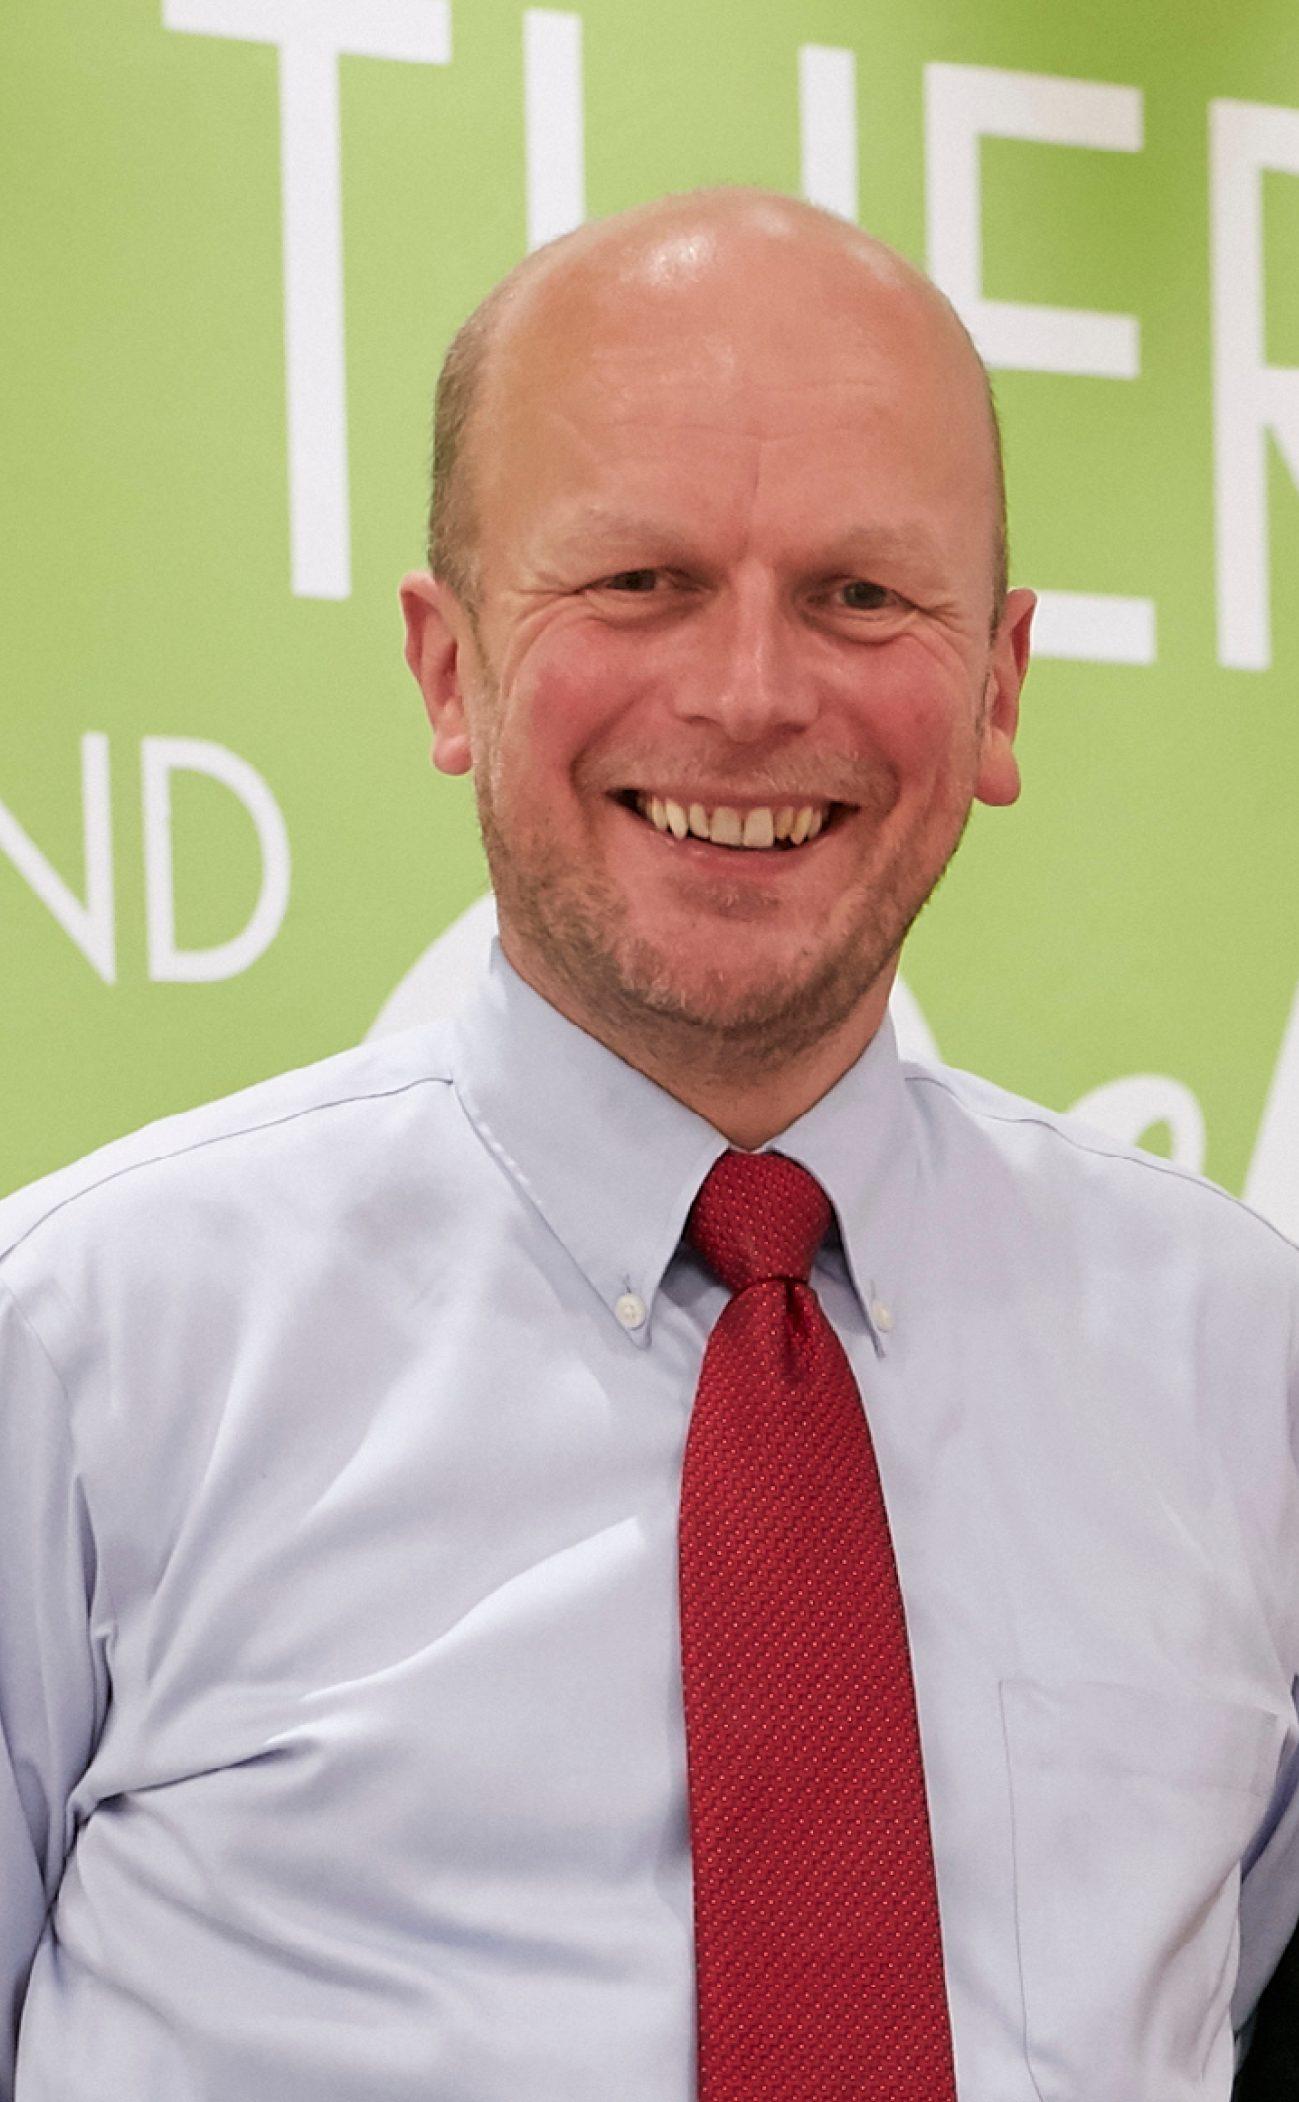 Martyn Broadest BSc (Hons), CIHCM